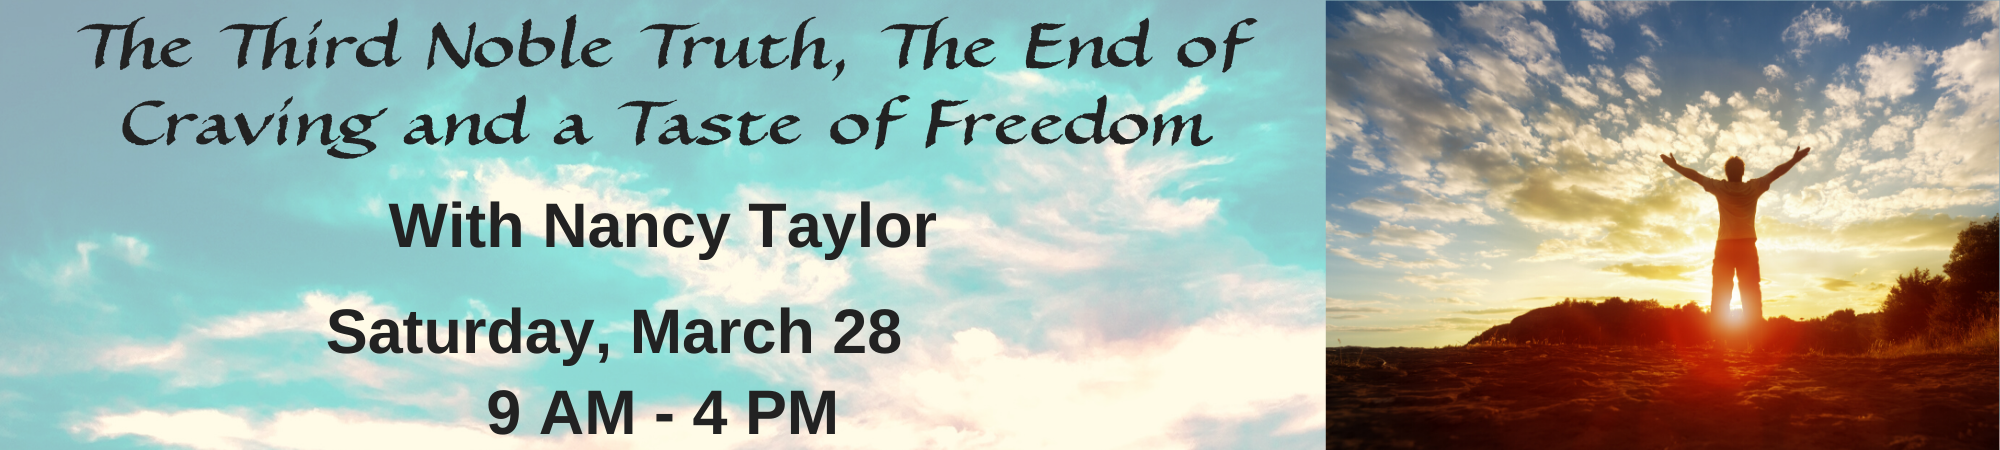 Nancy Taylor 2020 banner